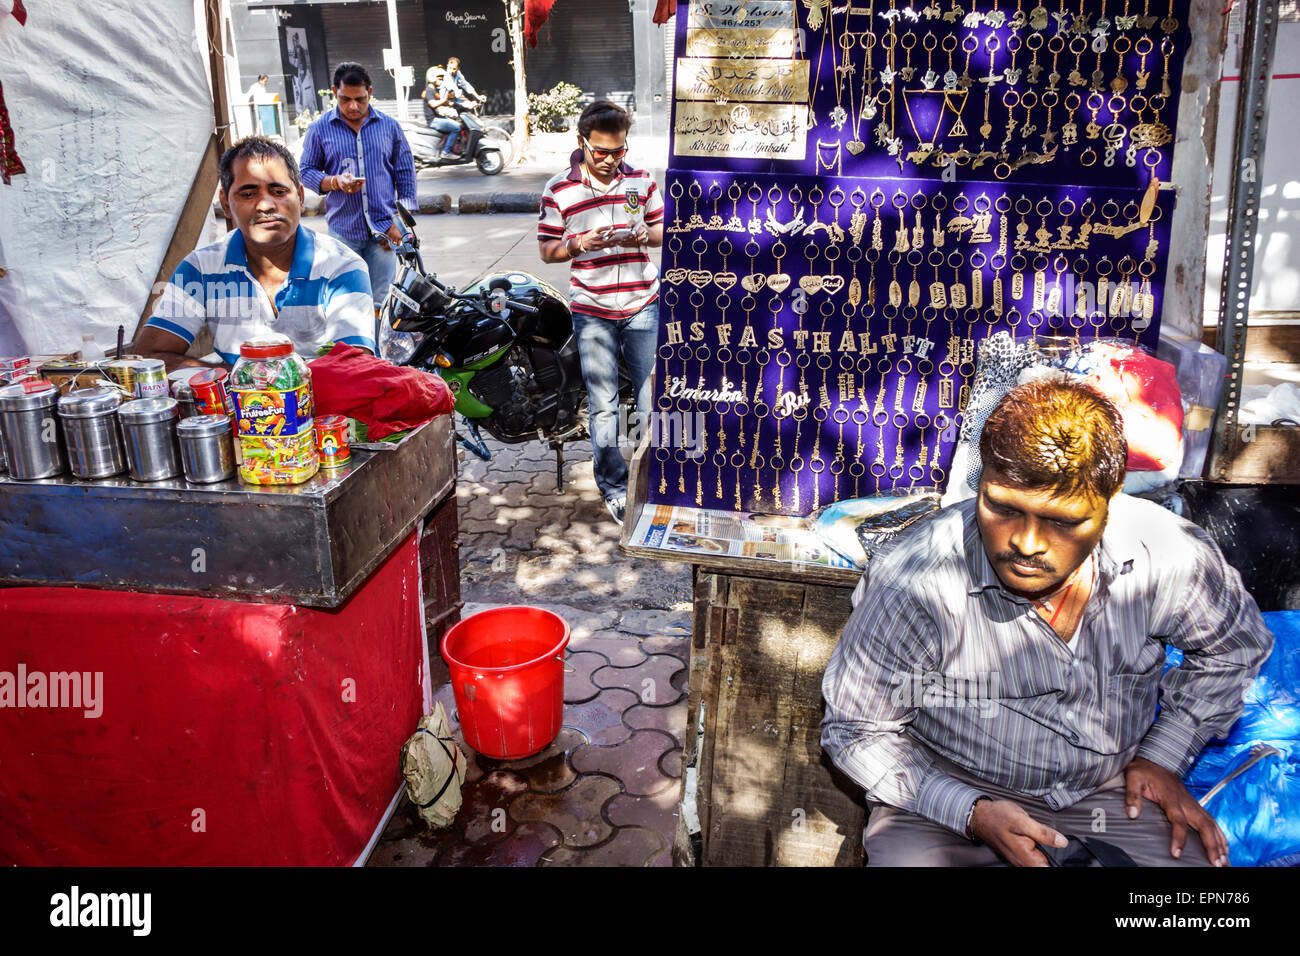 Mumbai India Asian Apollo Bandar Colaba Indumati Sakharkar Marg Causeway Market shopping man sidewalk vendor jewelry - Stock Image